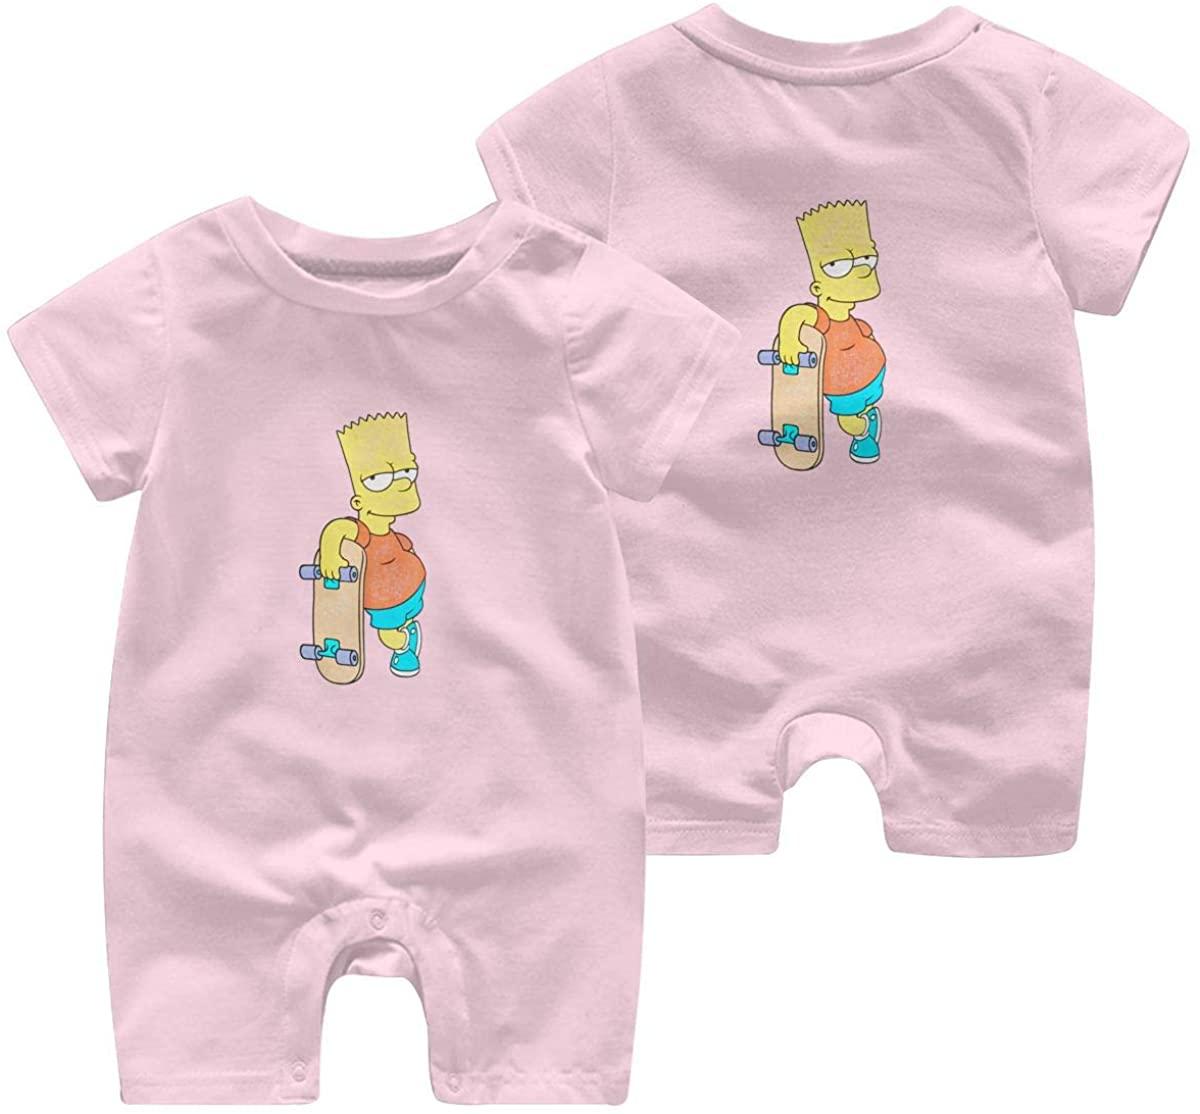 The Simpsons Leisure Baby Short Sleeve Jumpsuit Kid Breathable Baby Pajama Sleeper Cotton Romper